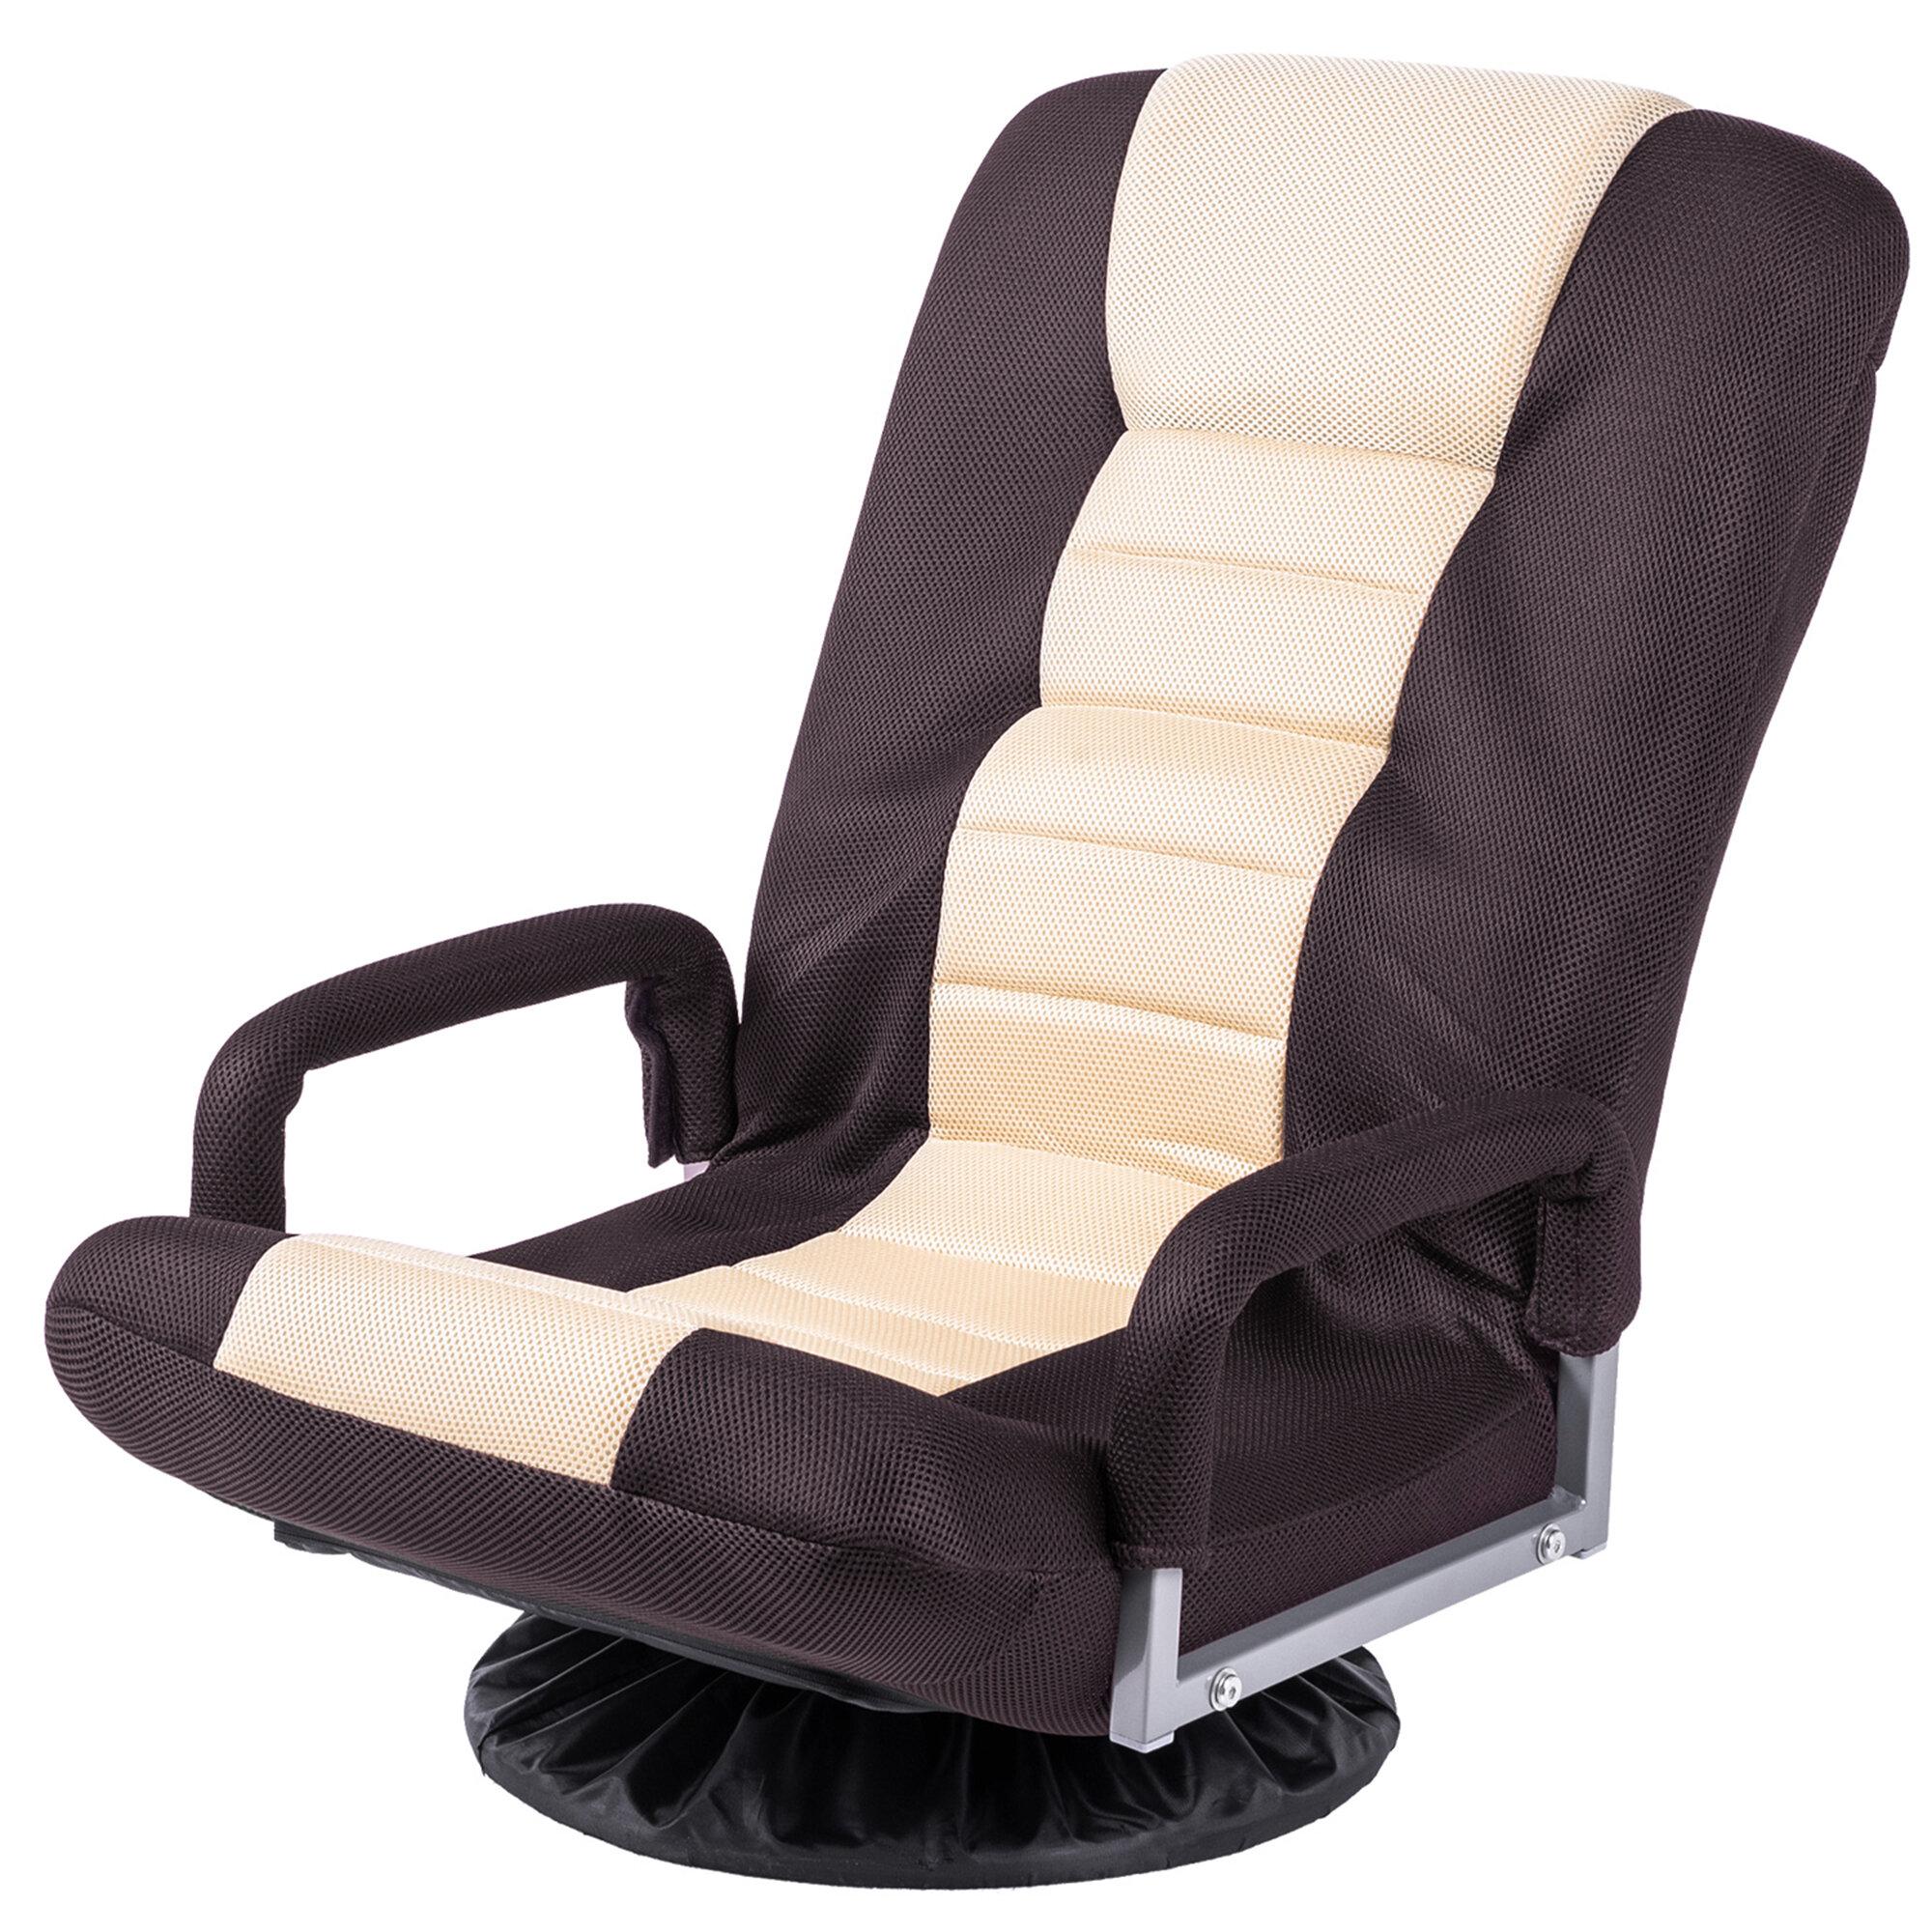 Trule 7-Position Video Game Chair | Wayfair